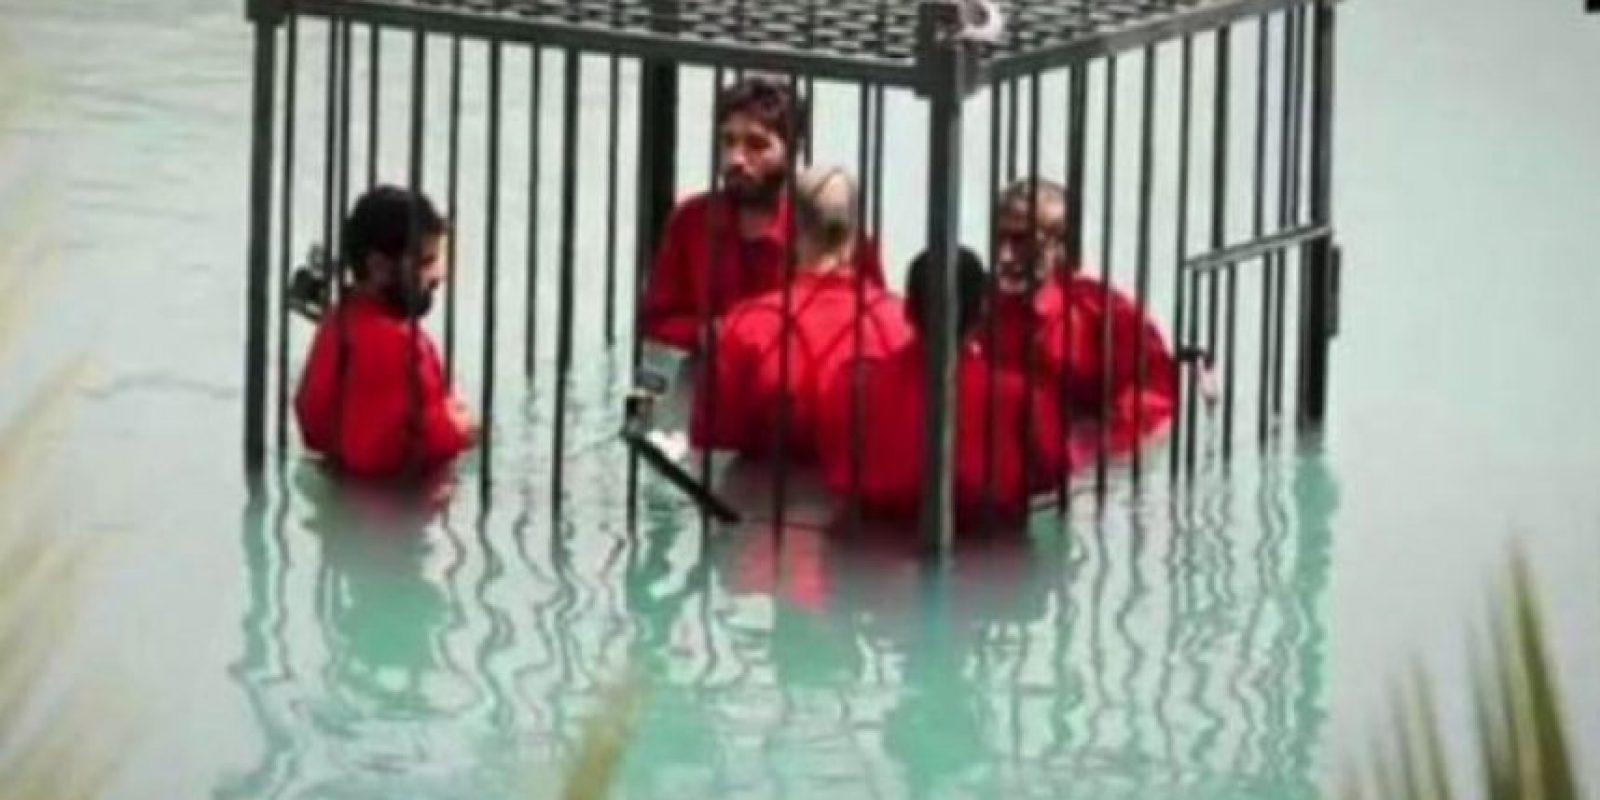 Ahogar en una jaula a sus víctimas Foto:Twitter.com – Archivo